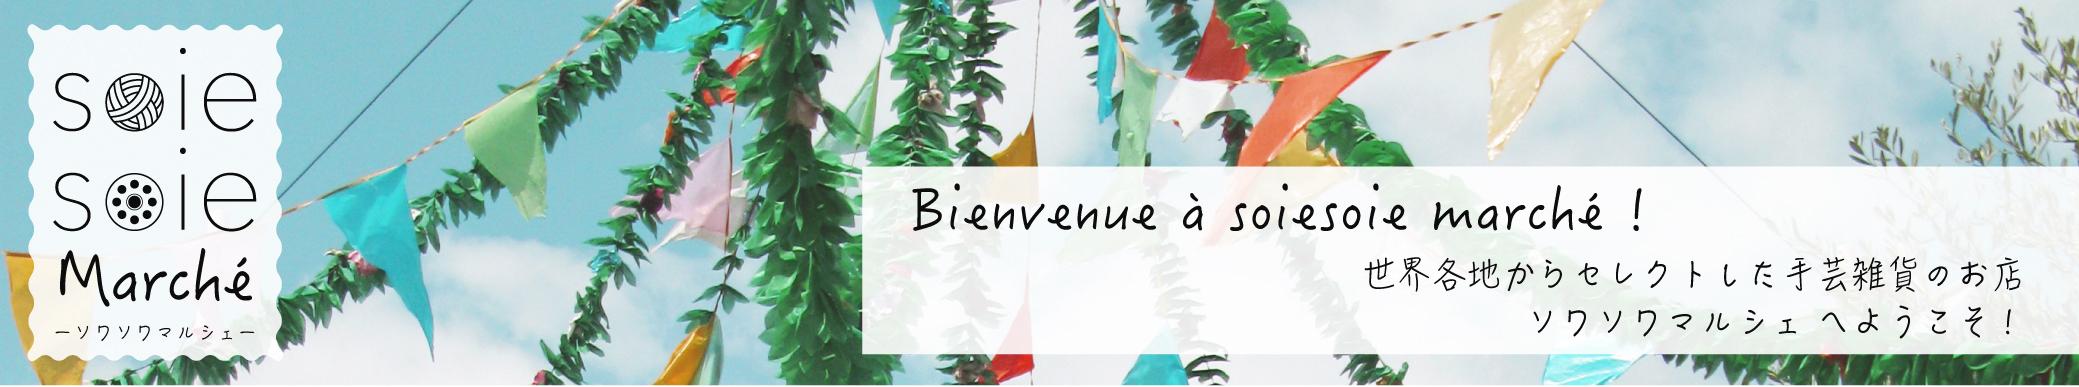 soiesoie marche -ソワソワマルシェ-